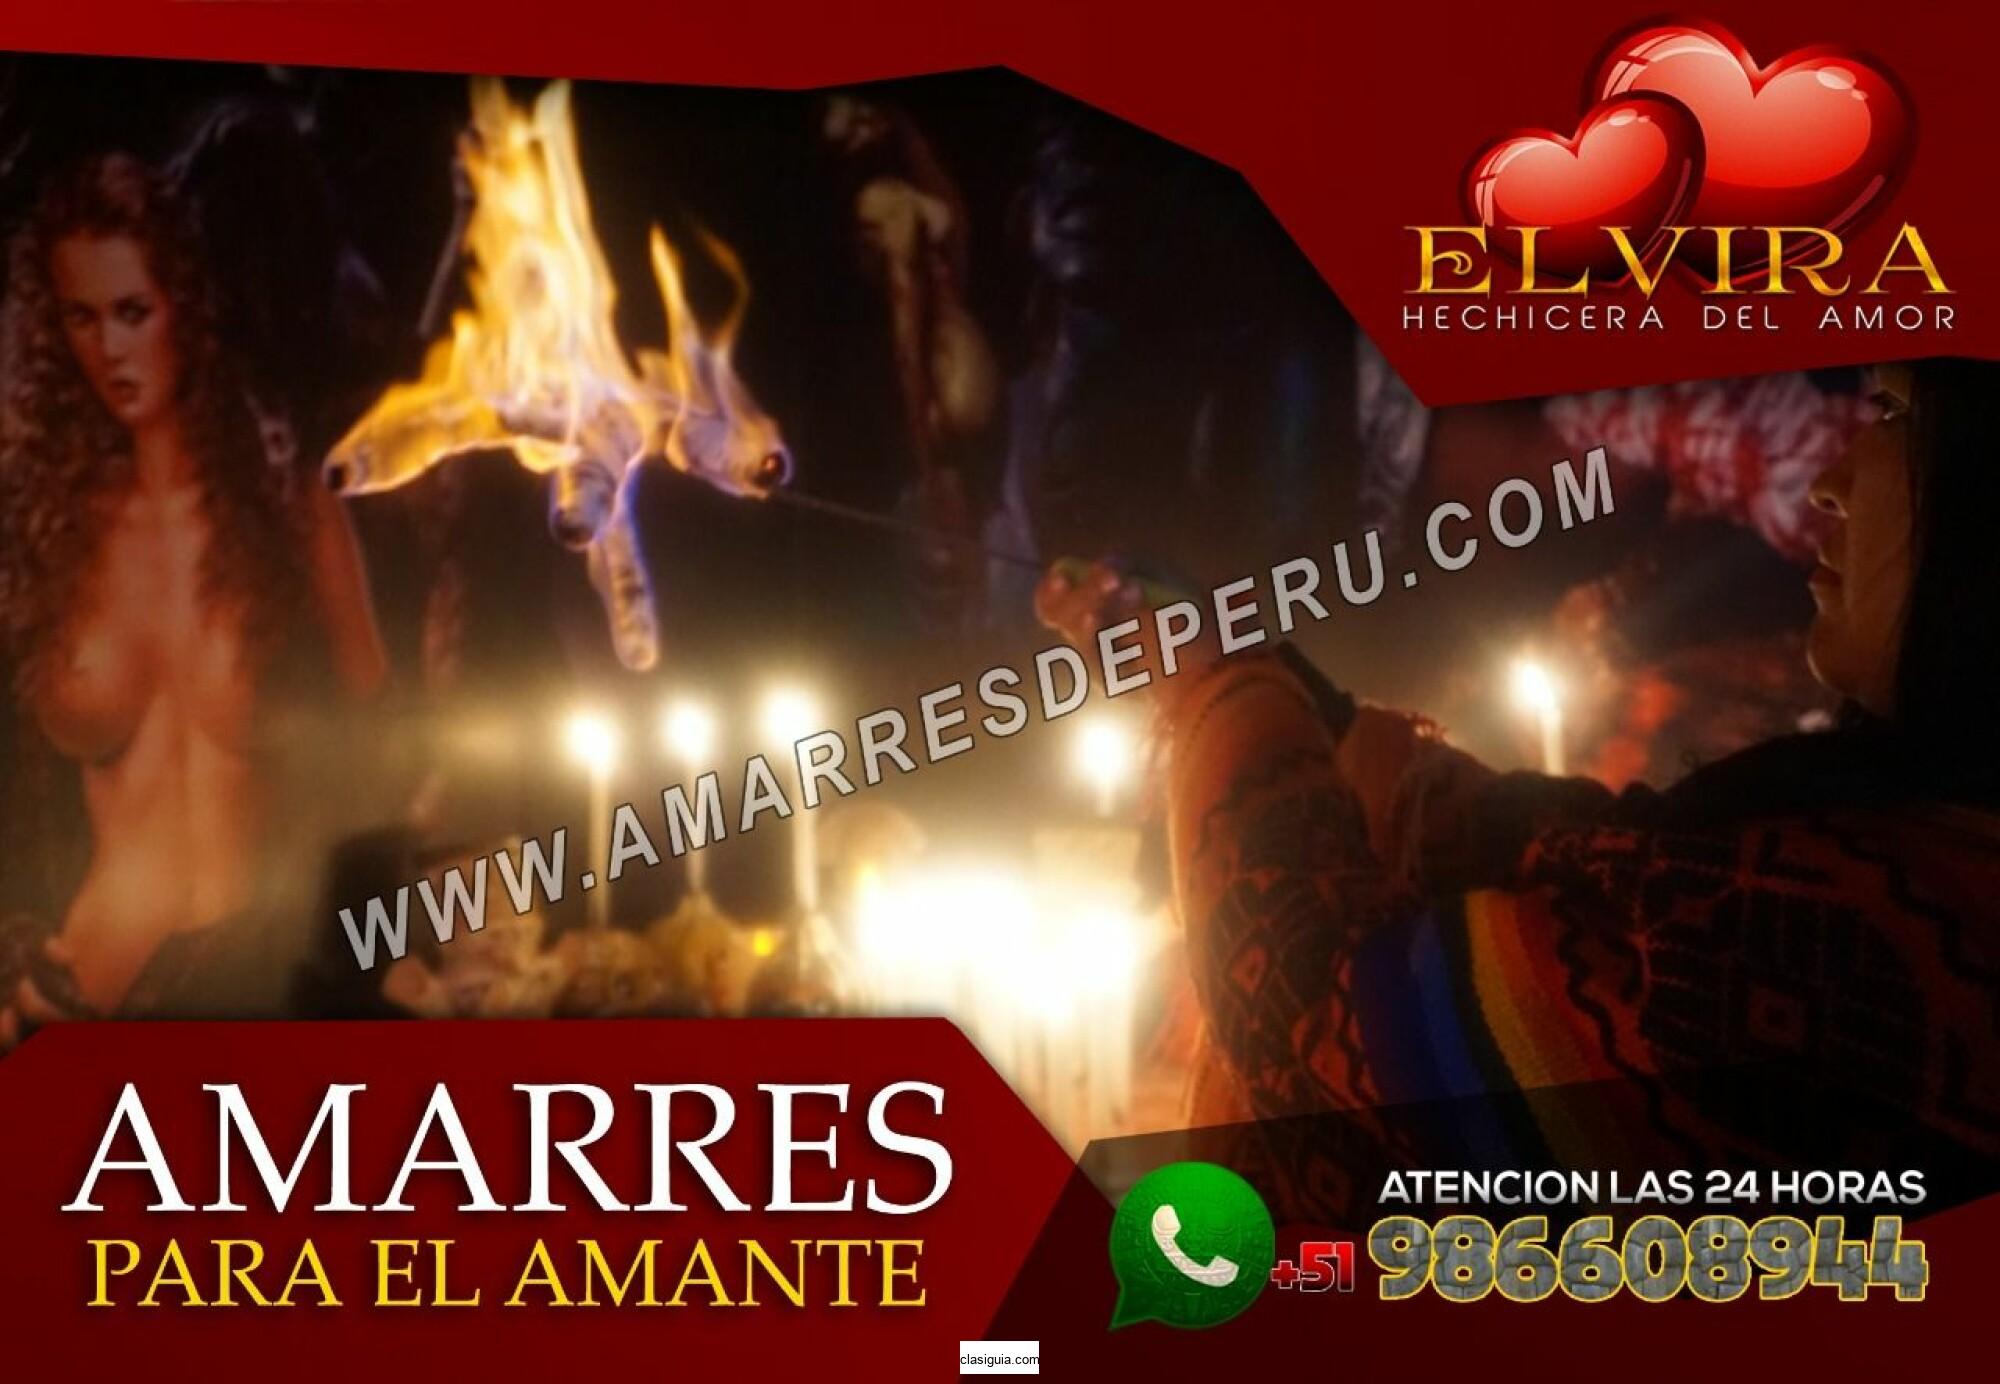 HECHICERA VUDU ELVIRA  EN HONDURAS